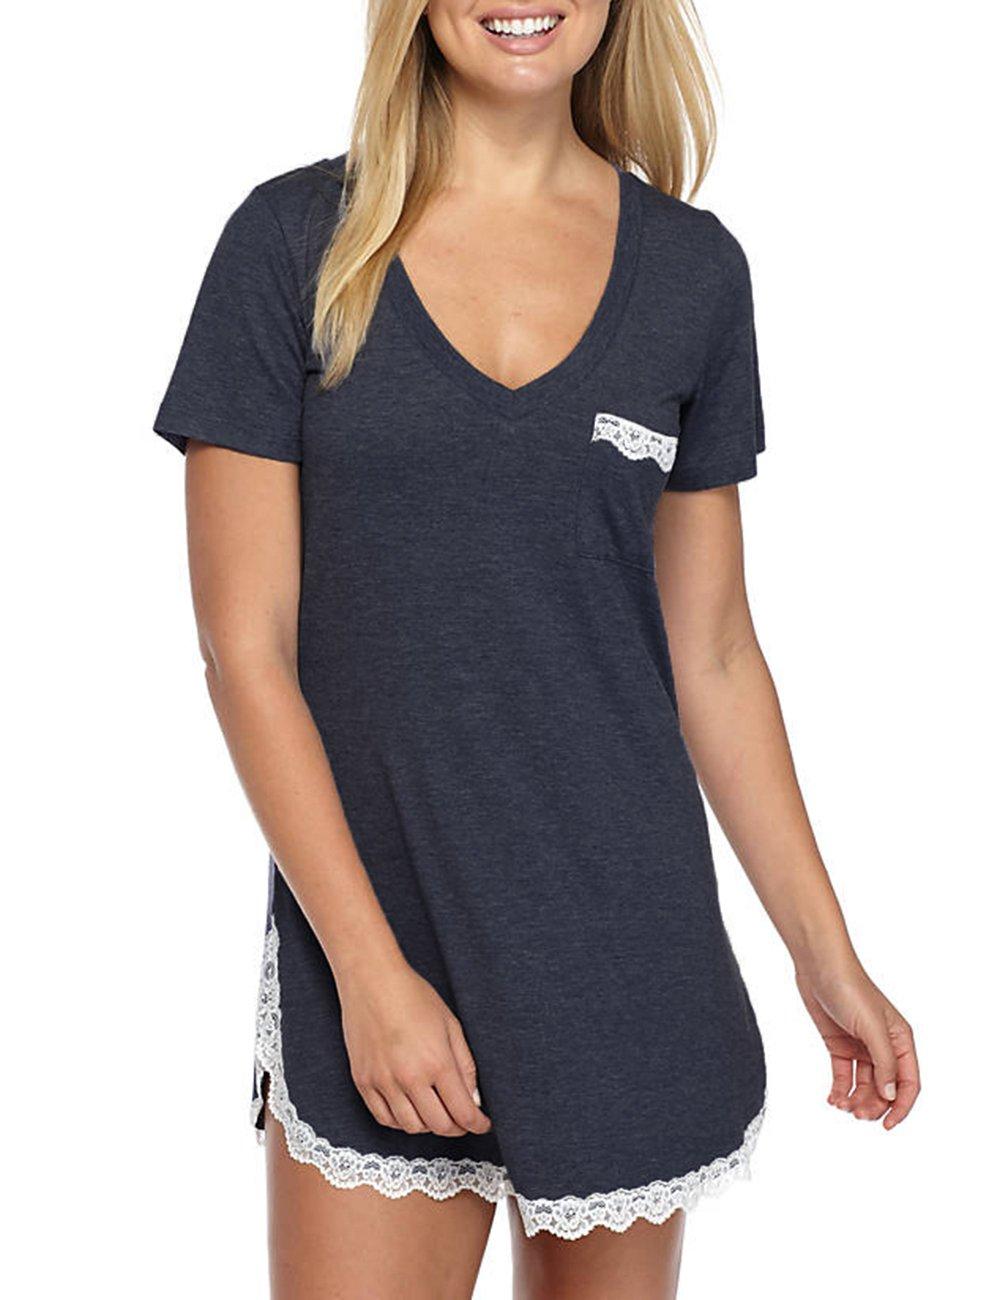 Sechico Women's Nightgown Short Sleeve Lace Chemise Shirt Sleepwear